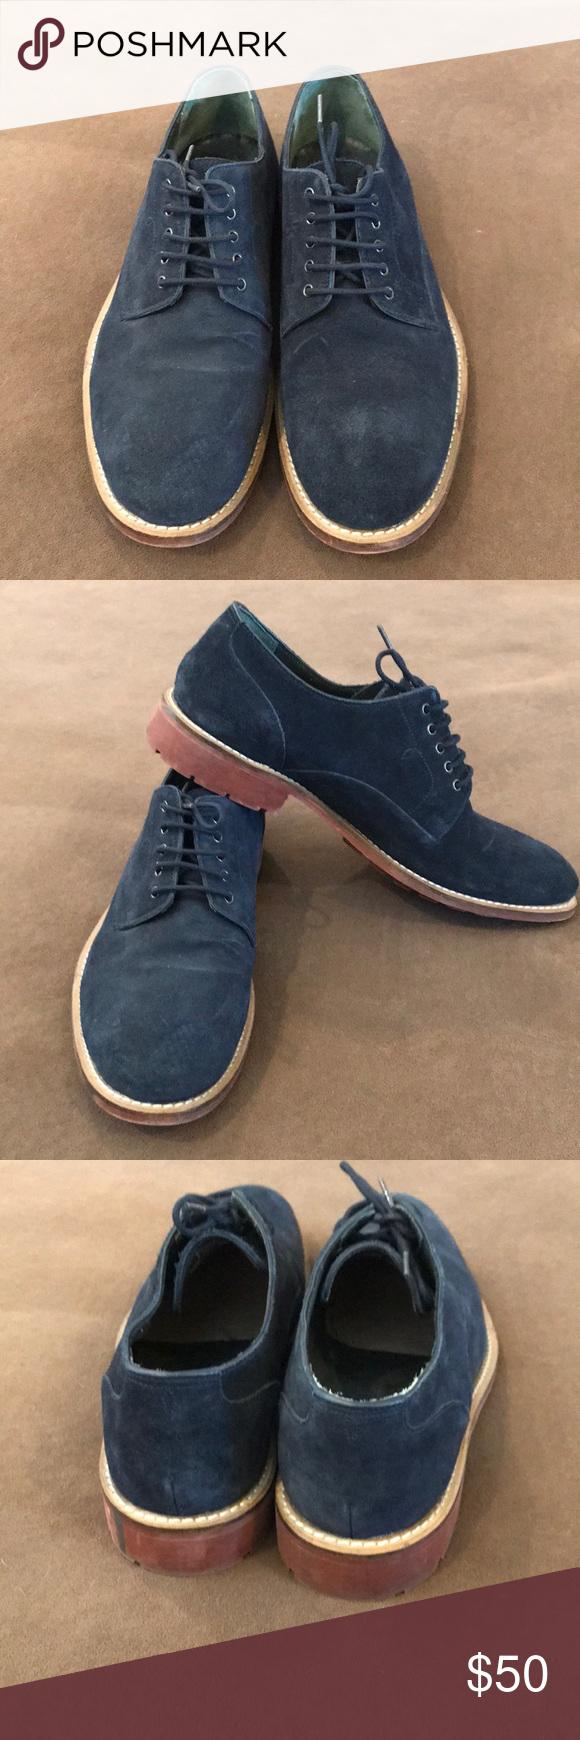 Ted Baker Tich D2 Blue suede shoes